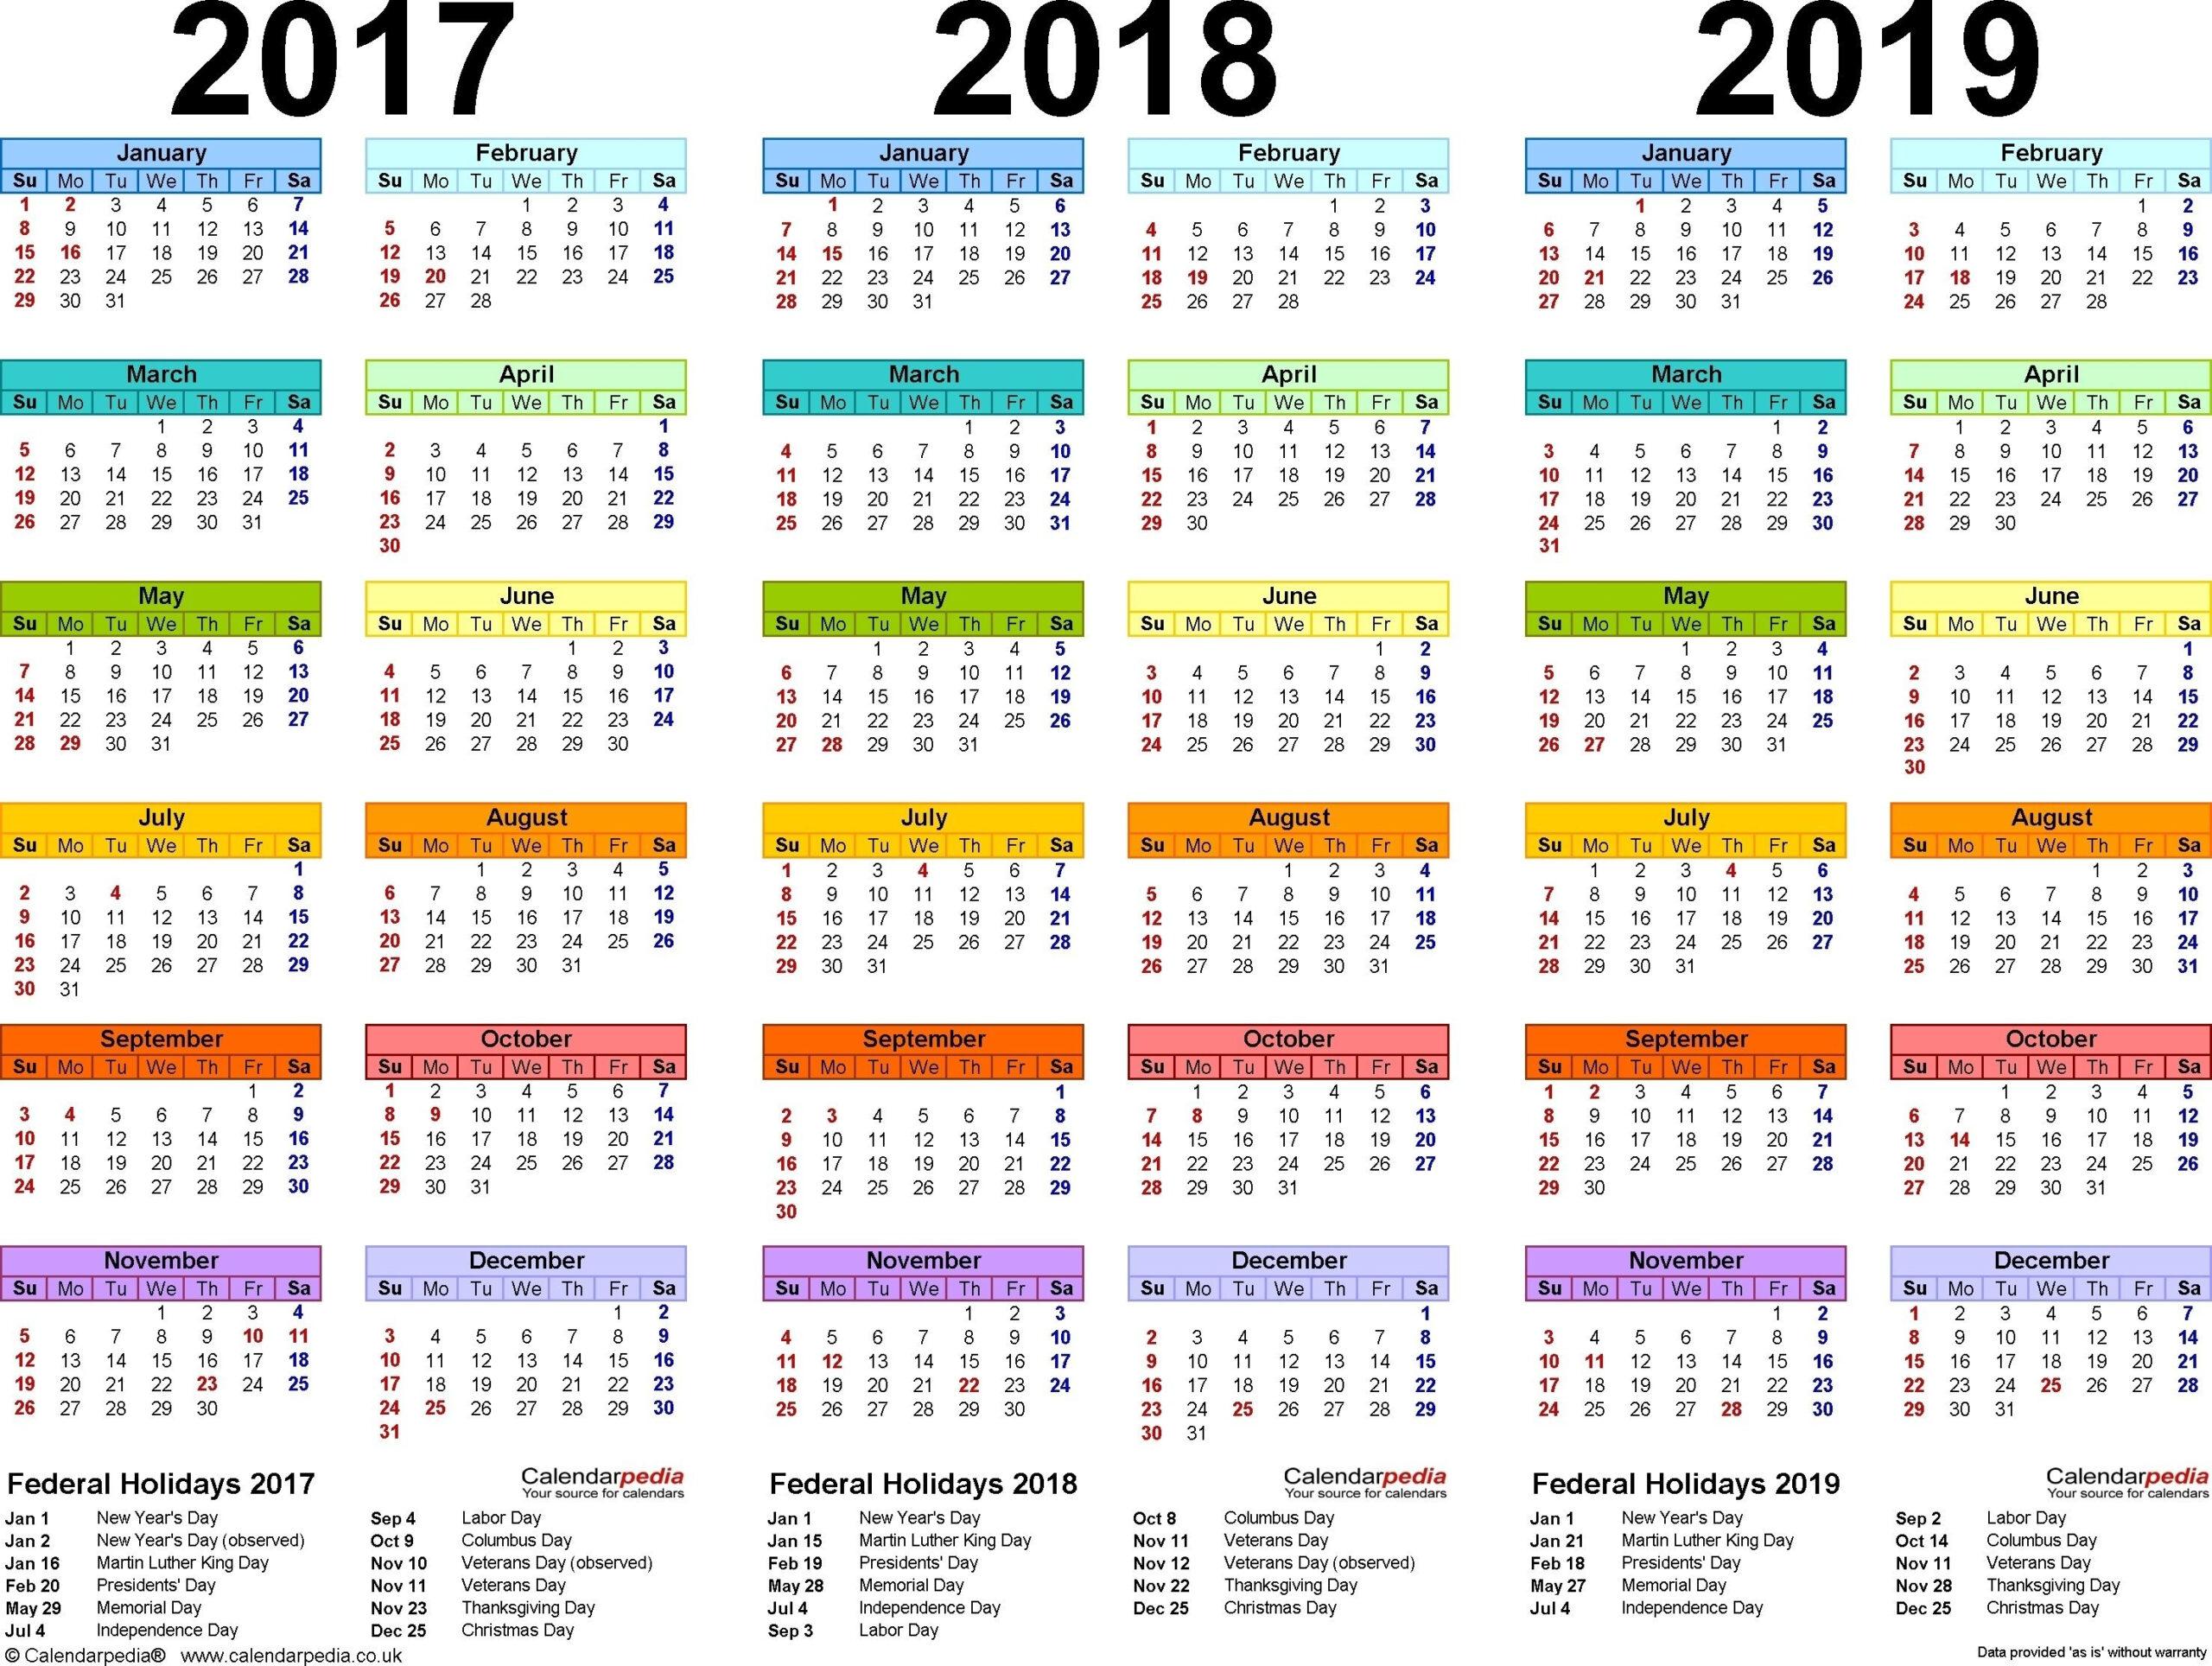 Depo Shot Calendar 2021 inside Depo Provera Injection Calendar 2021